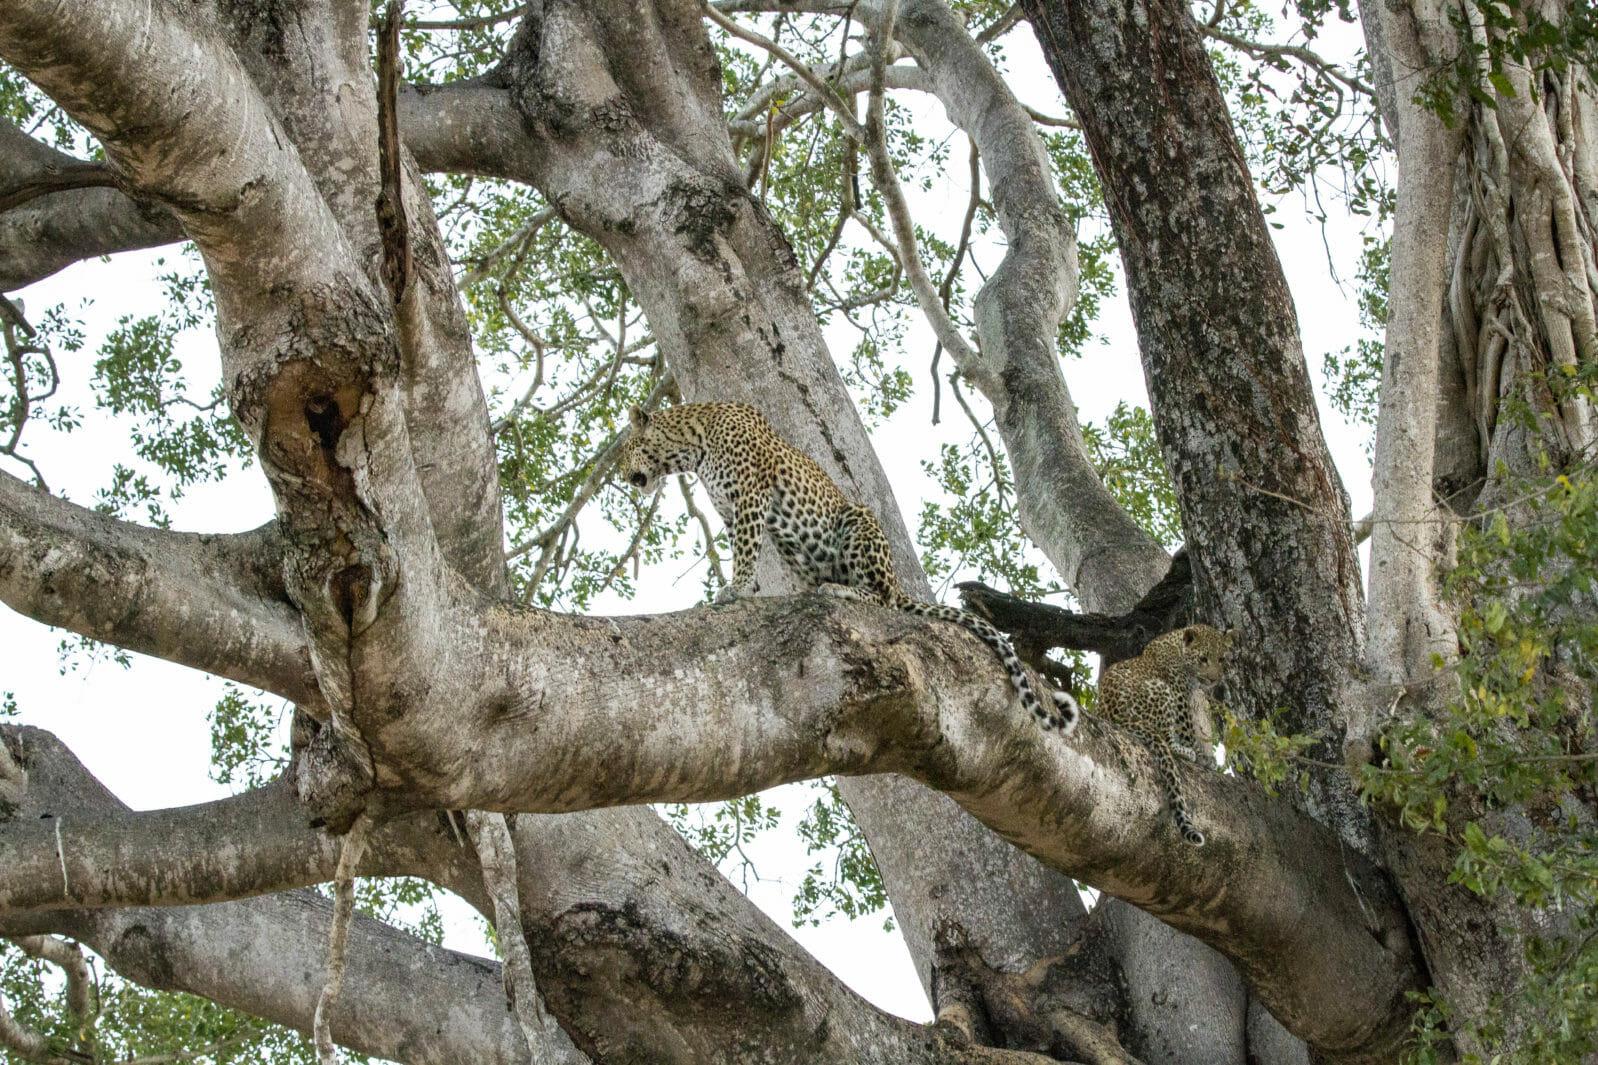 Londolozis Real Trees Of Life The Sycamore Fig Londolozi Blog